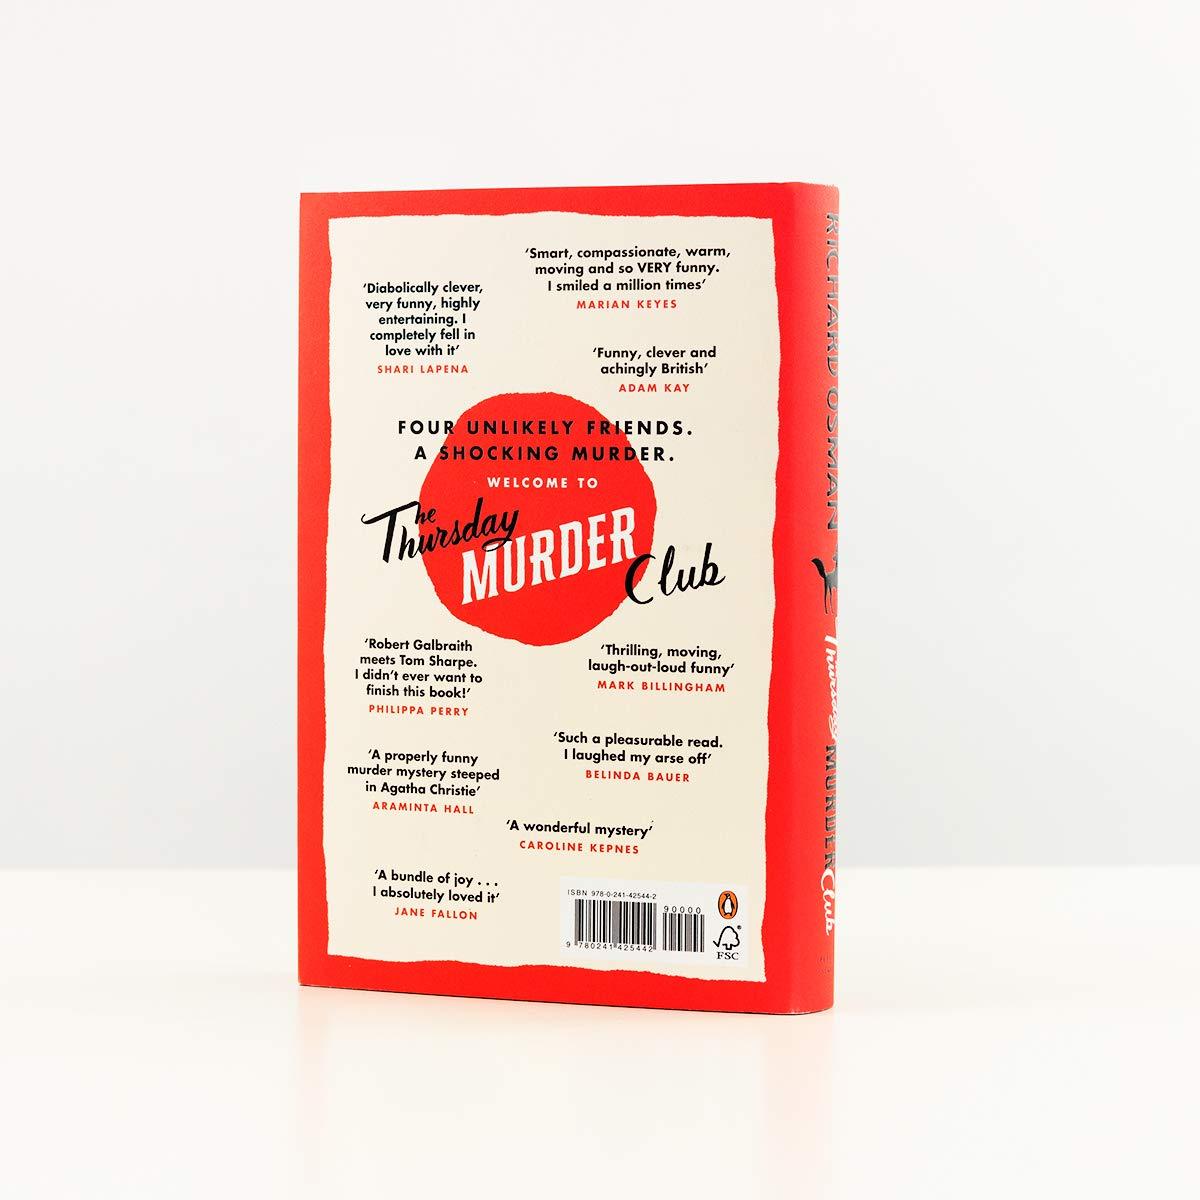 The Thursday Murder Club | Papercut